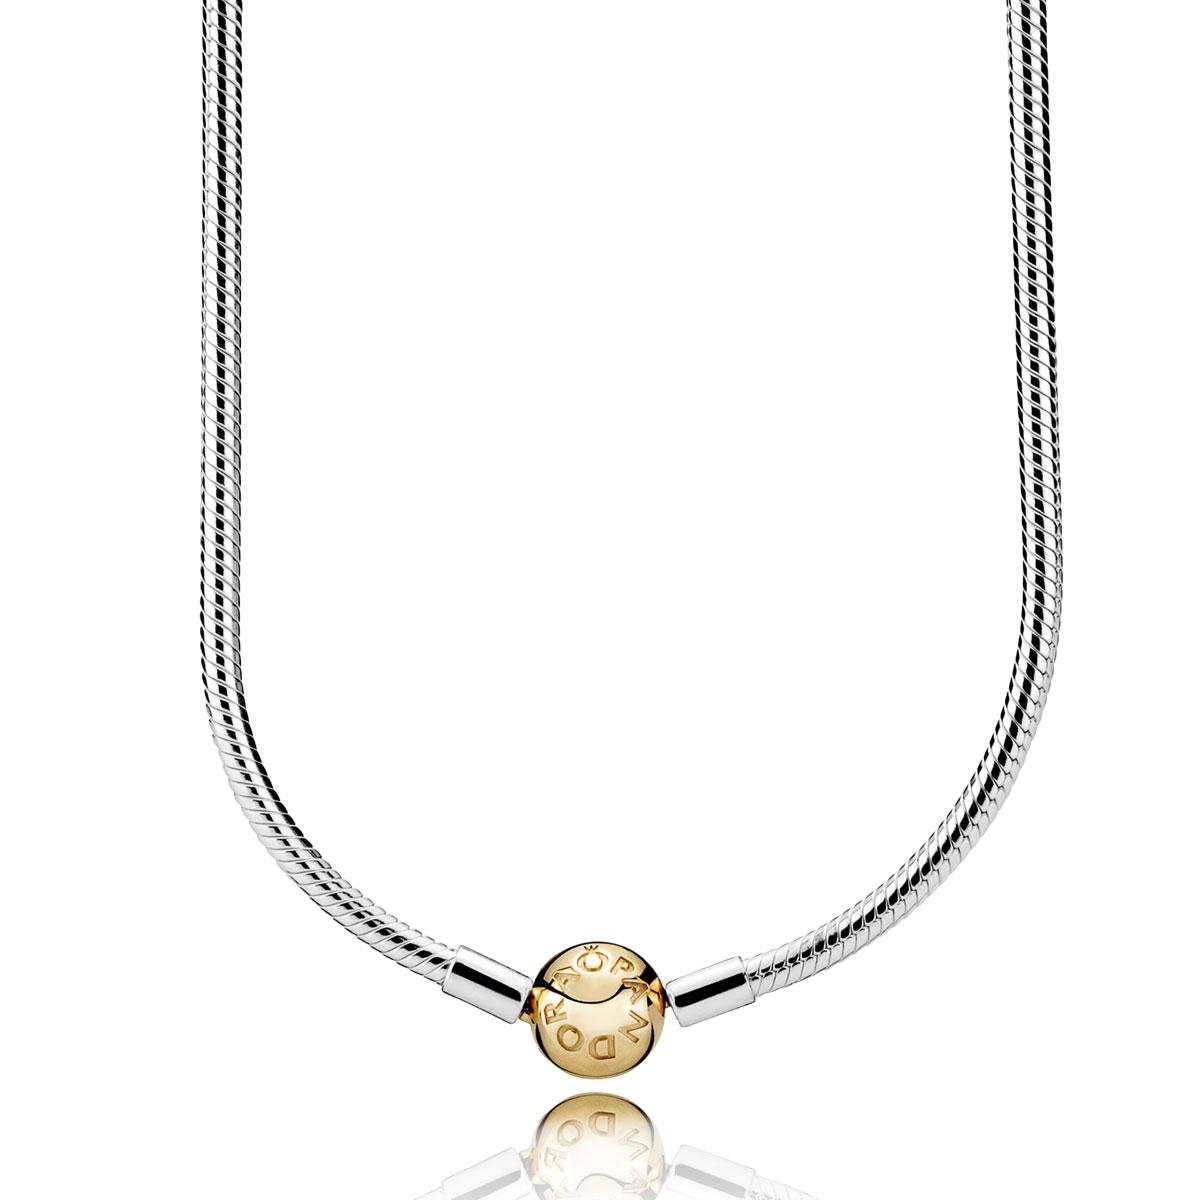 Pandora Women Gold Plated Pendant Necklace - 580515CZ-45 IxvRTyTdou